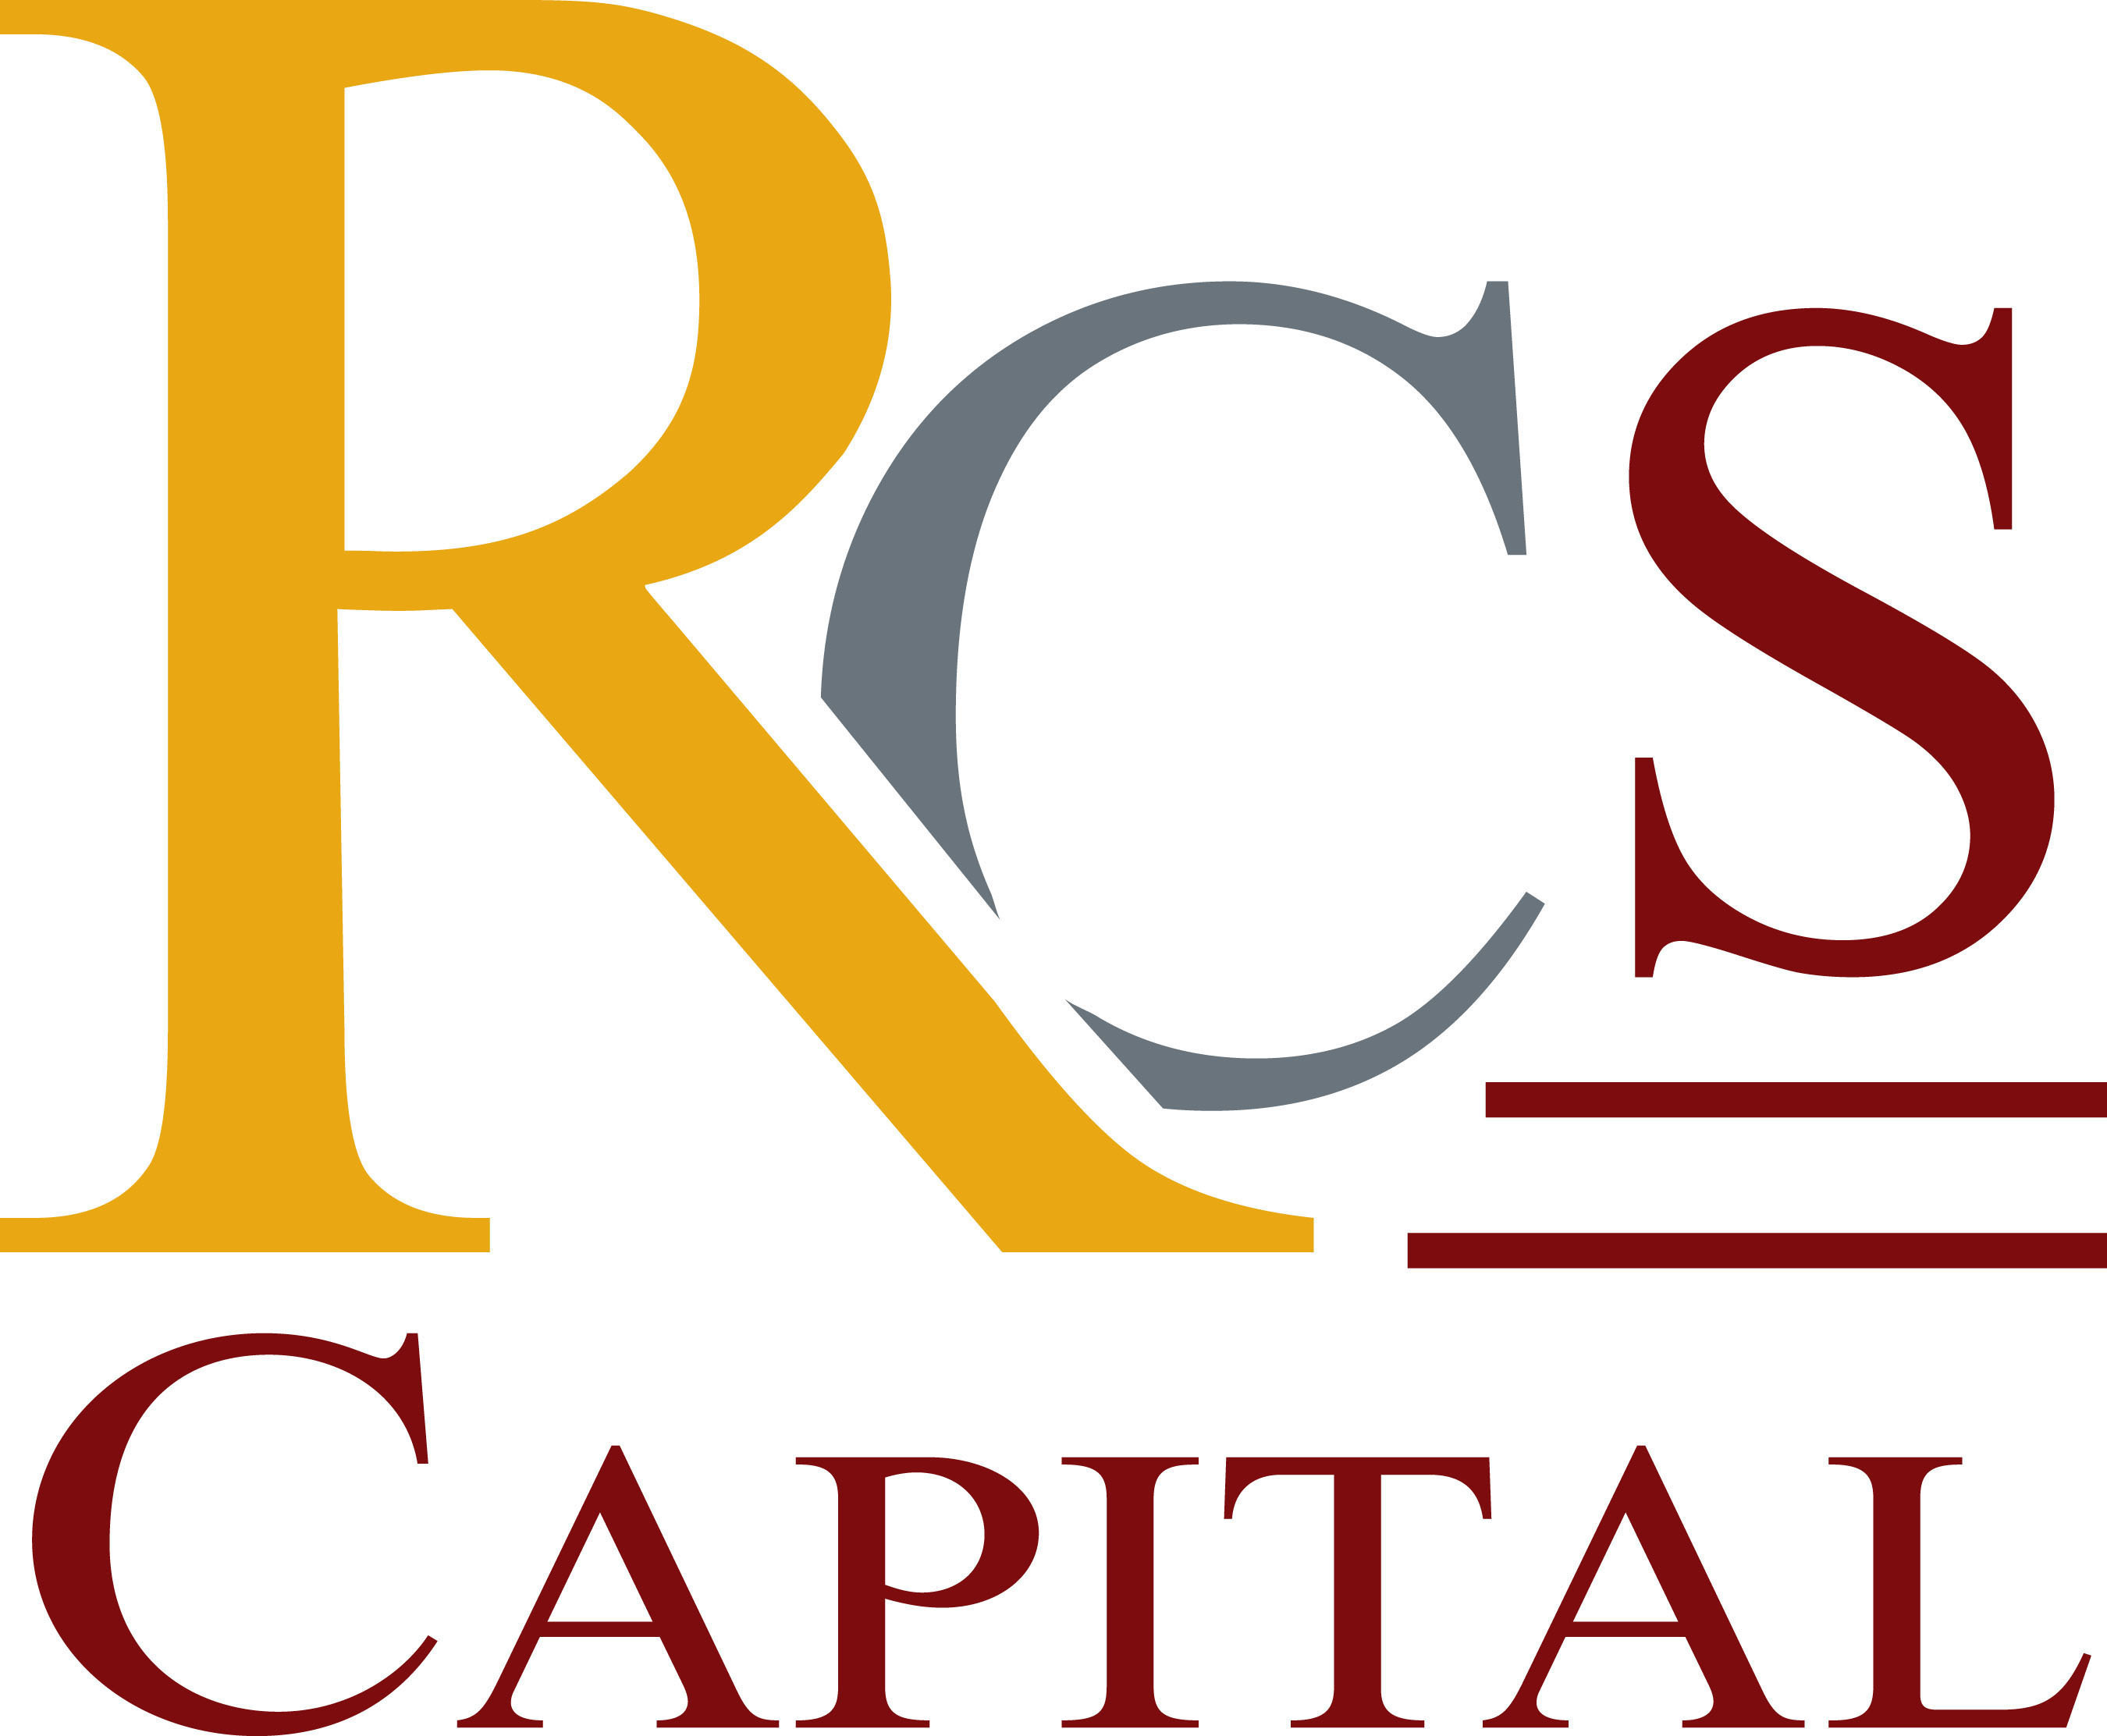 Rcs capital logo